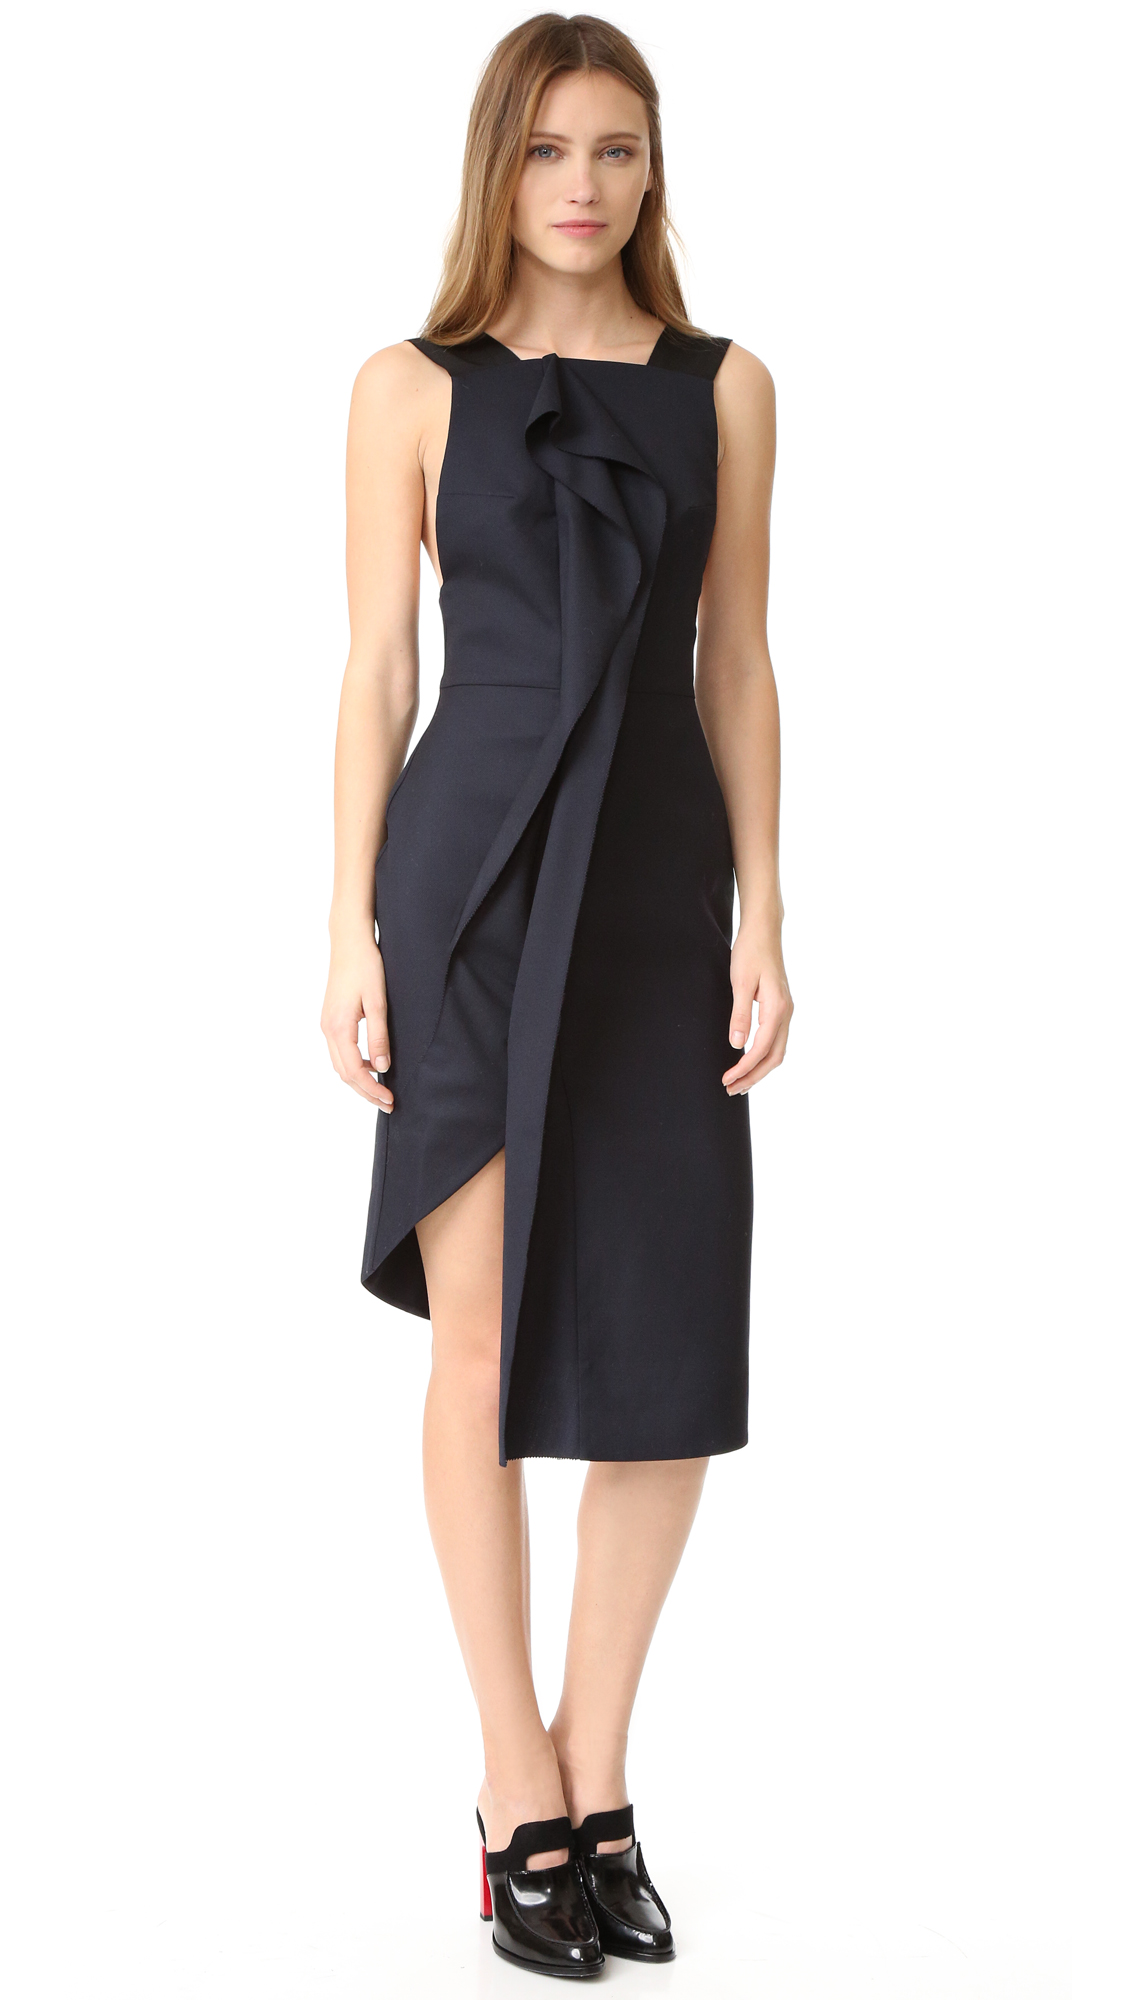 Acler Waverley Dress - Midnight at Shopbop